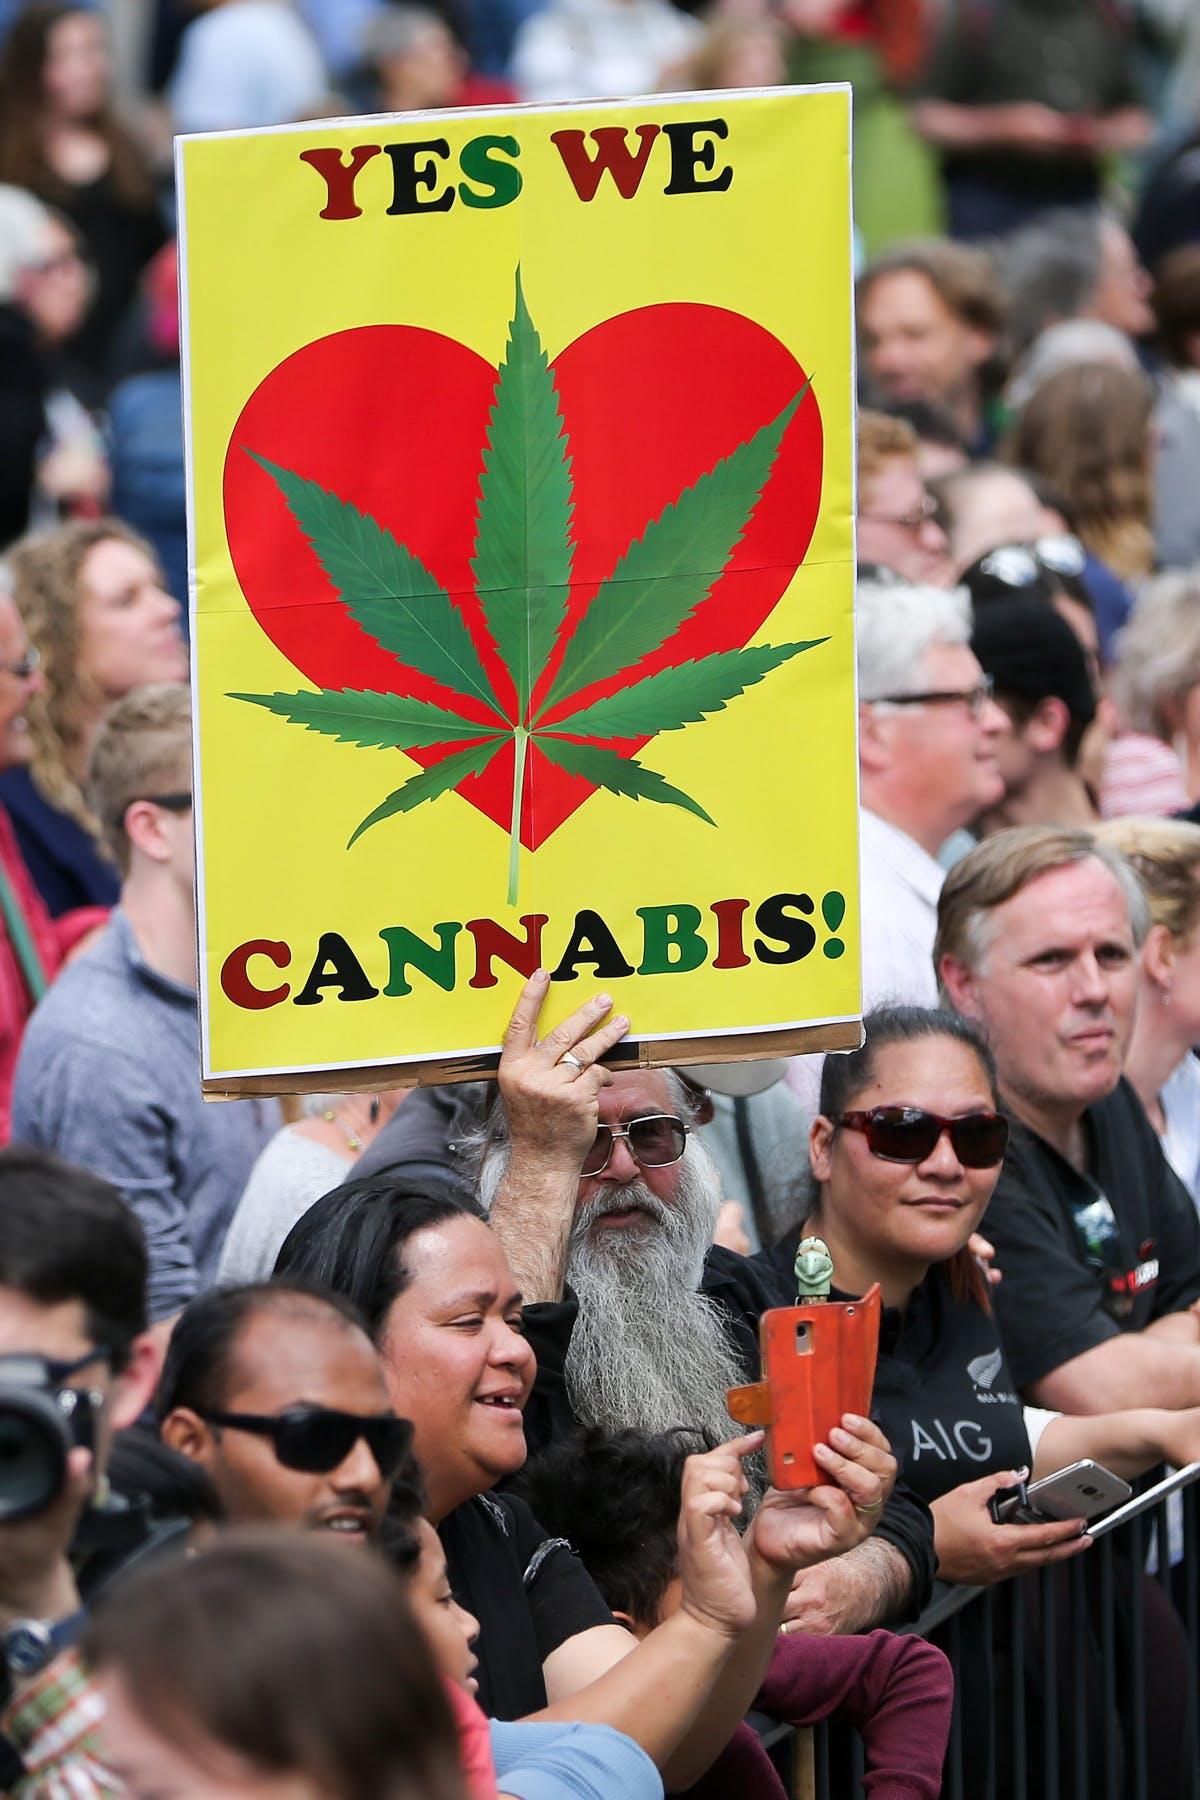 New Zealand may legalize recreational cannabis 2 of 2 Meet the cannabis kombucha guru